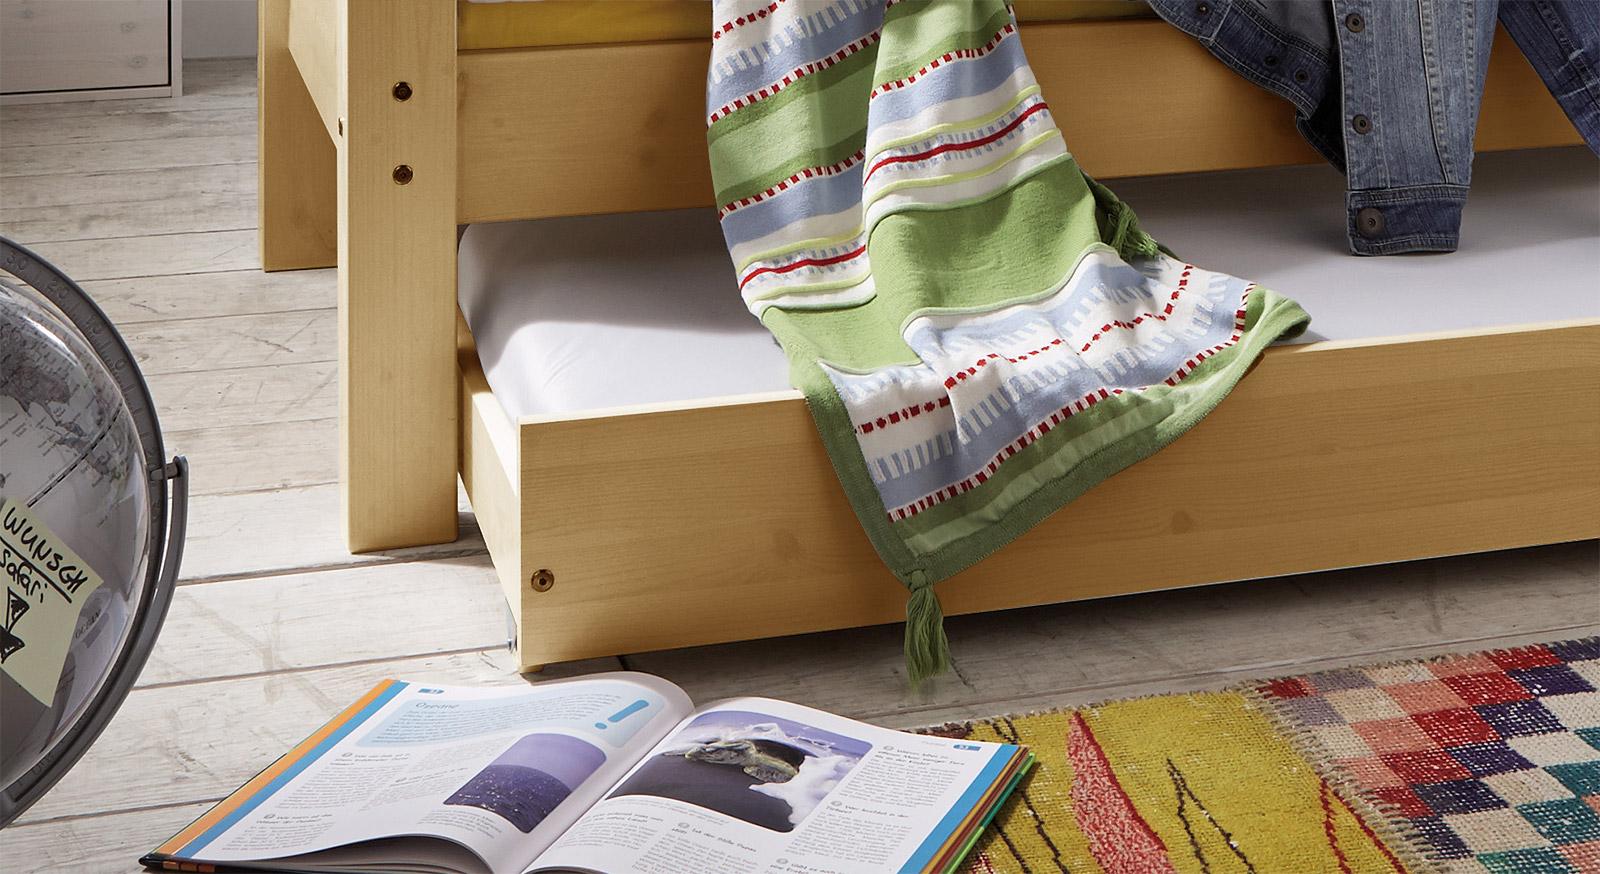 ausziehbett aus massiver kiefer kids dreams. Black Bedroom Furniture Sets. Home Design Ideas